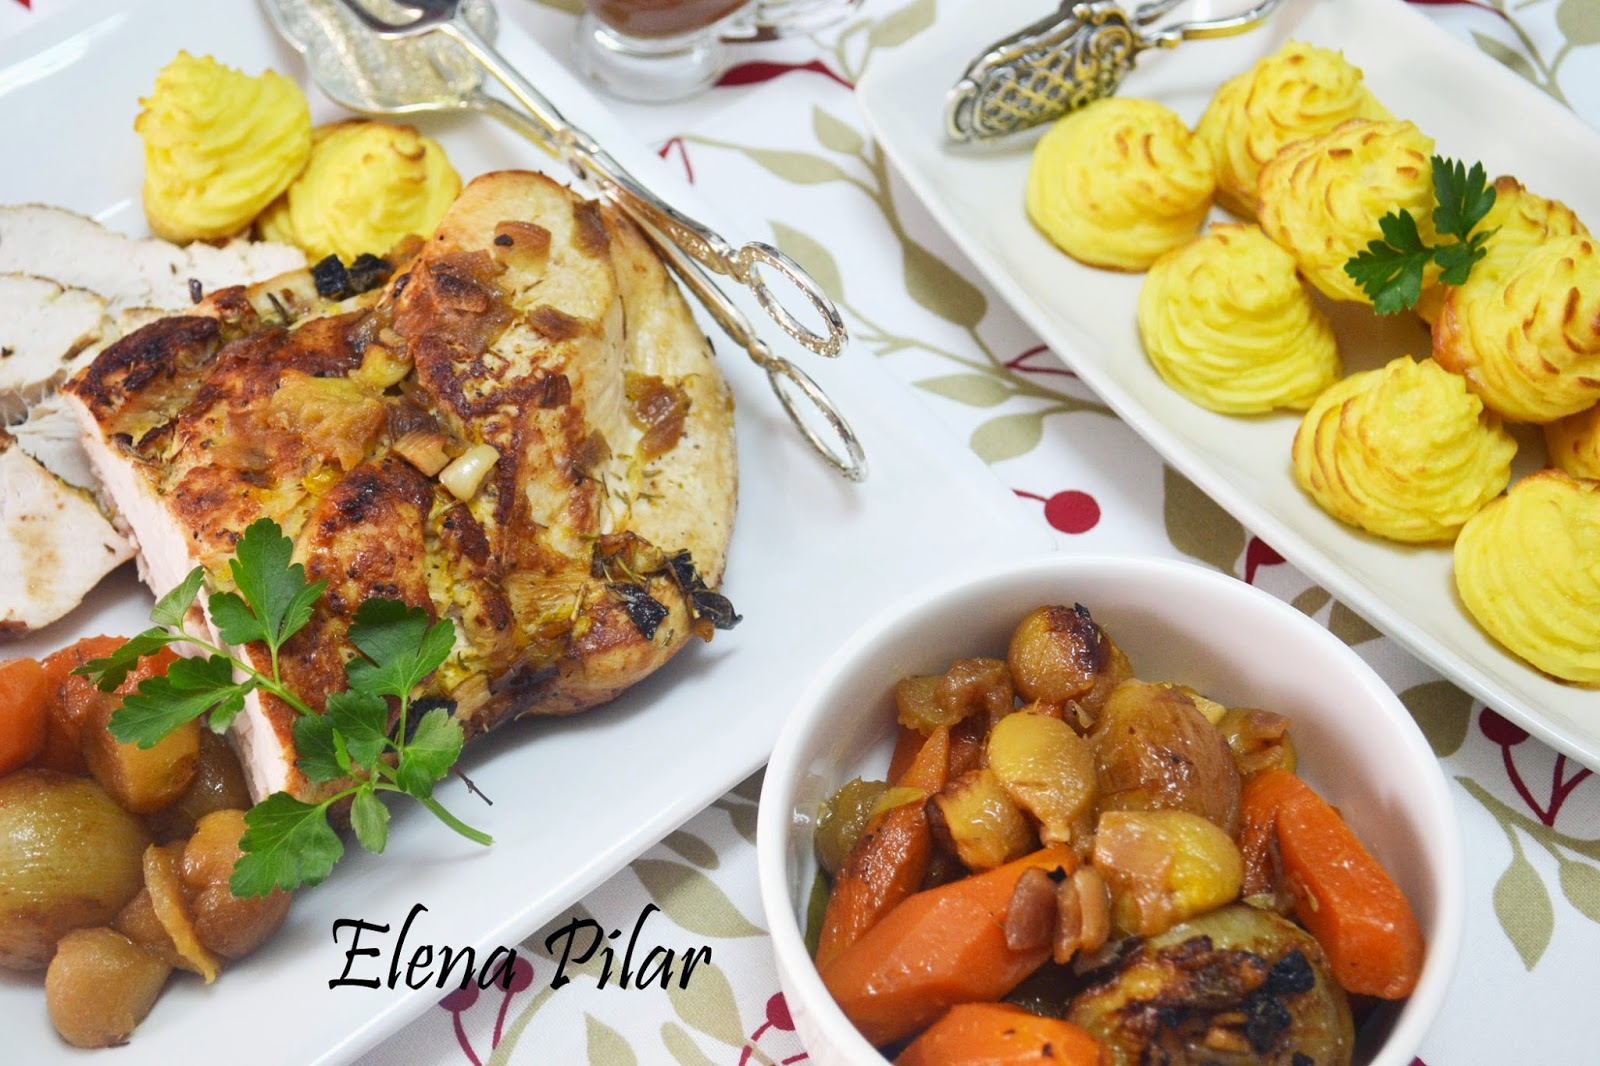 Mi recetario por elena pilar pechuga de pavo al horno con for Como cocinar pechuga de pavo